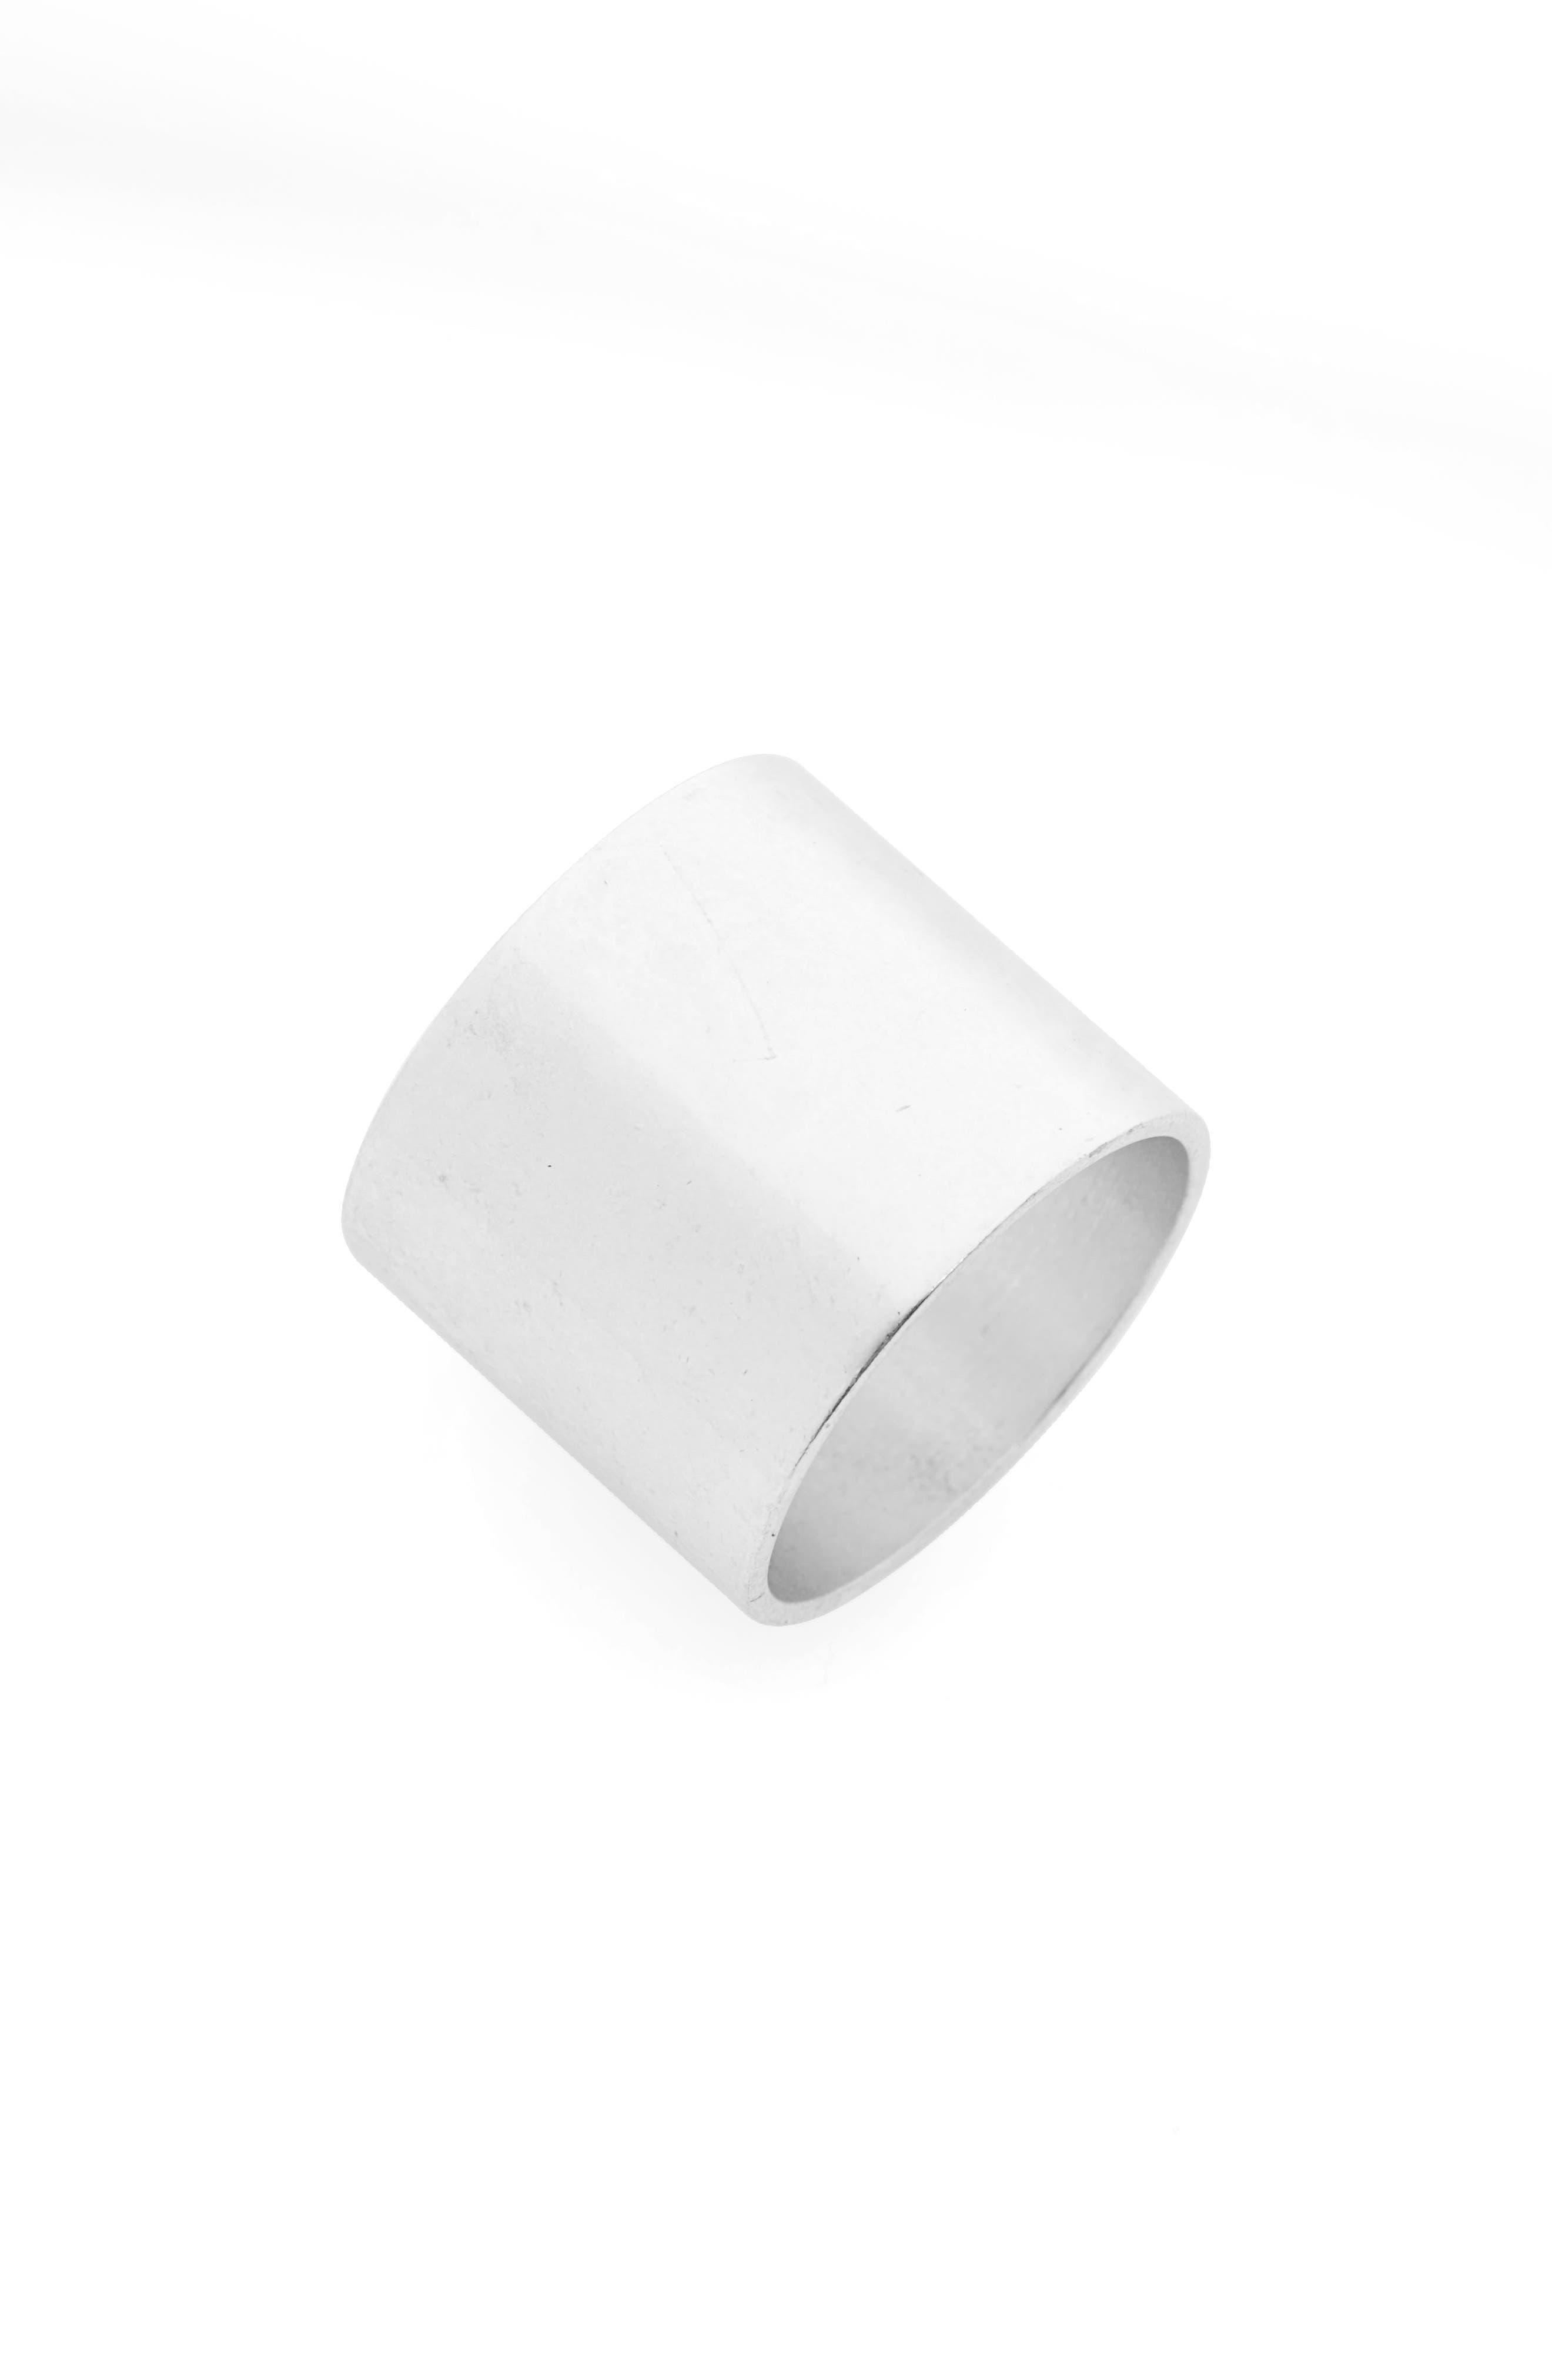 Band Ring,                             Main thumbnail 1, color,                             LIGHT SILVER OX